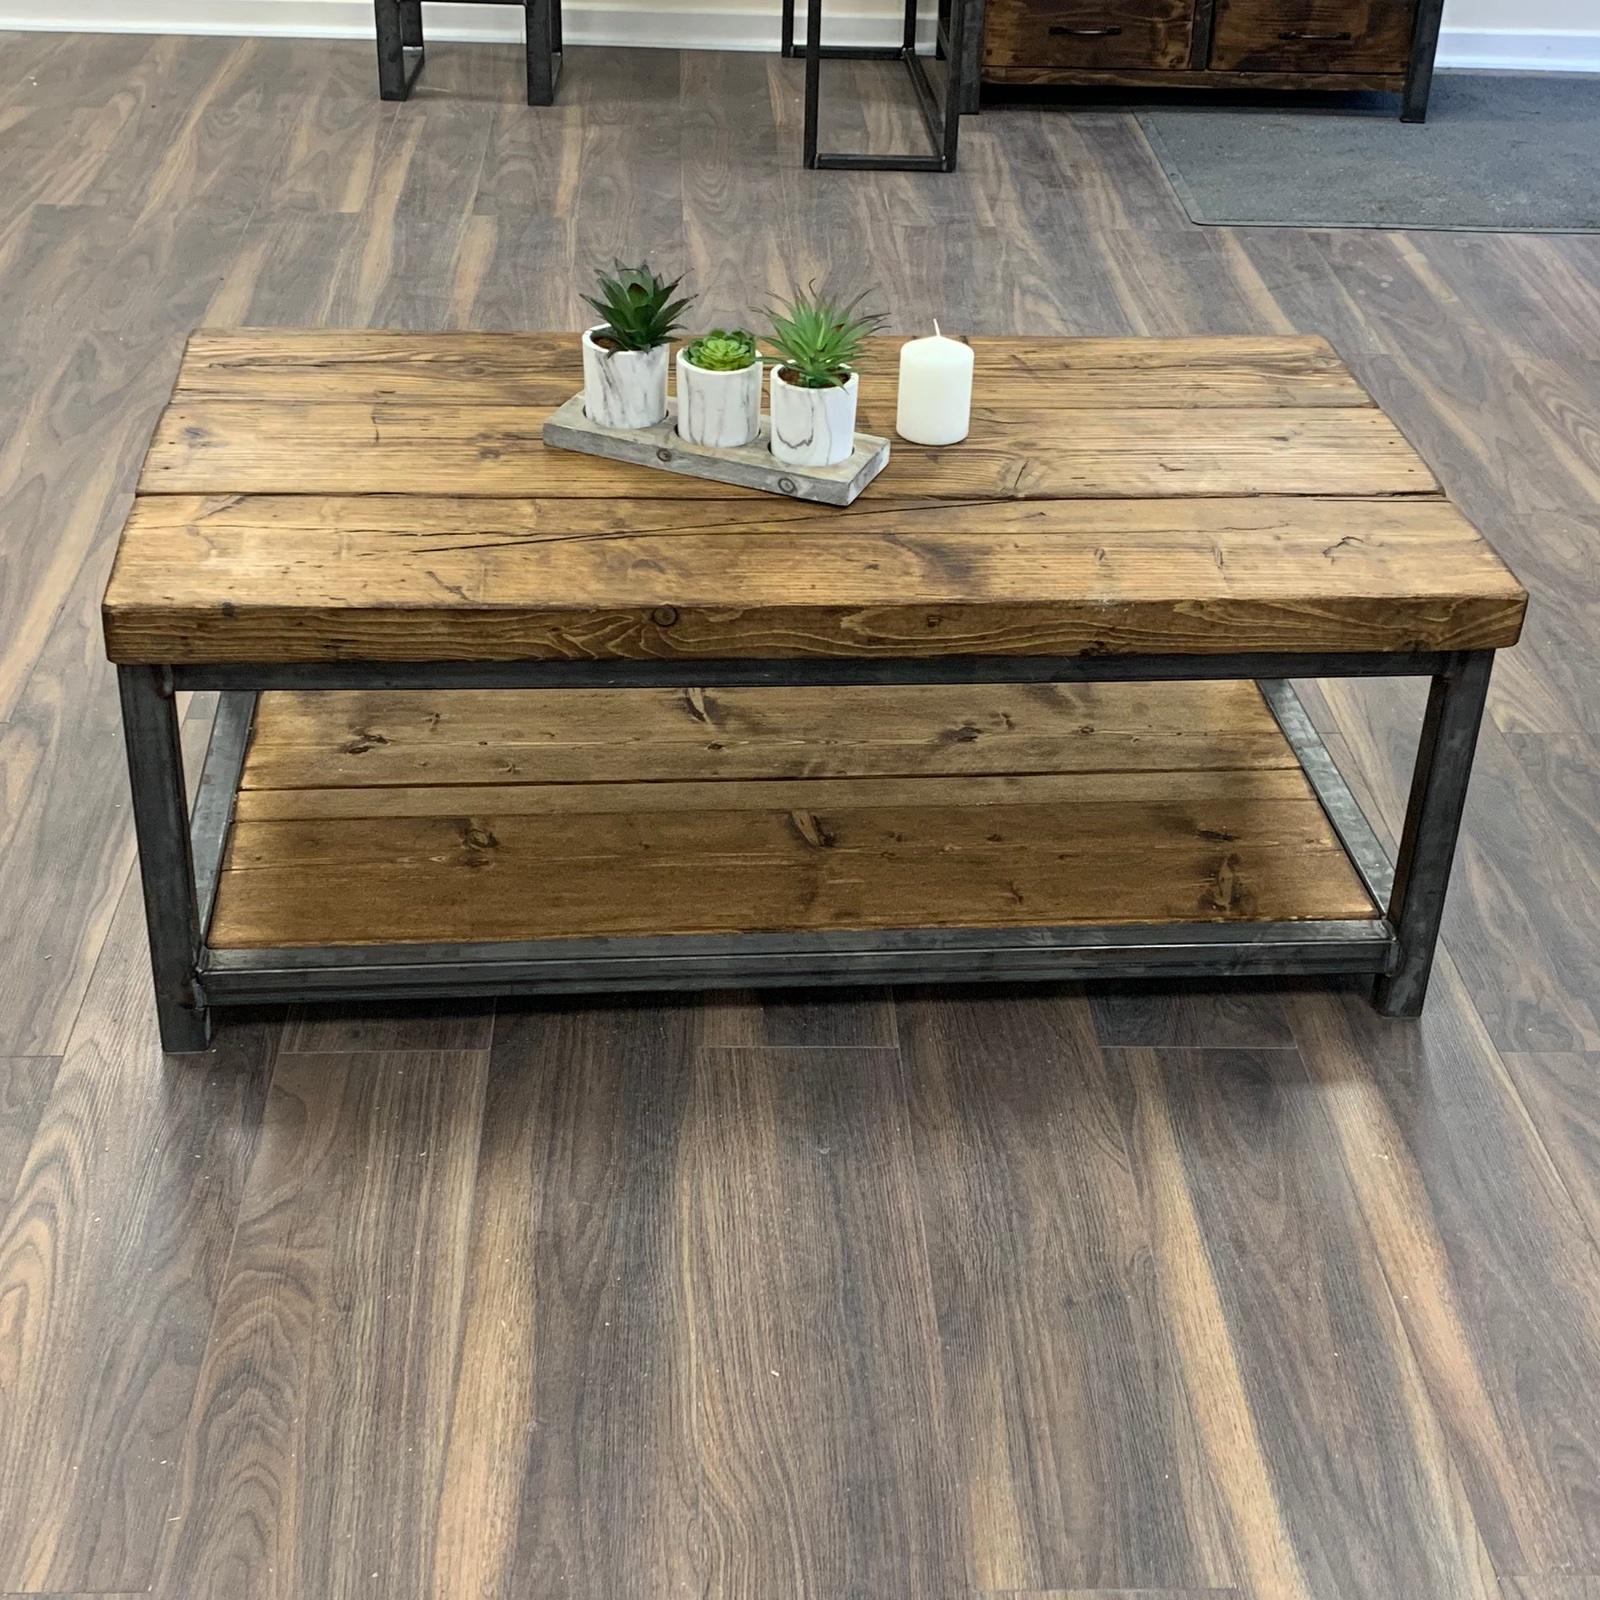 - Heavy Coffee Table Solid Wood Rustic Handmade Pine Industrial